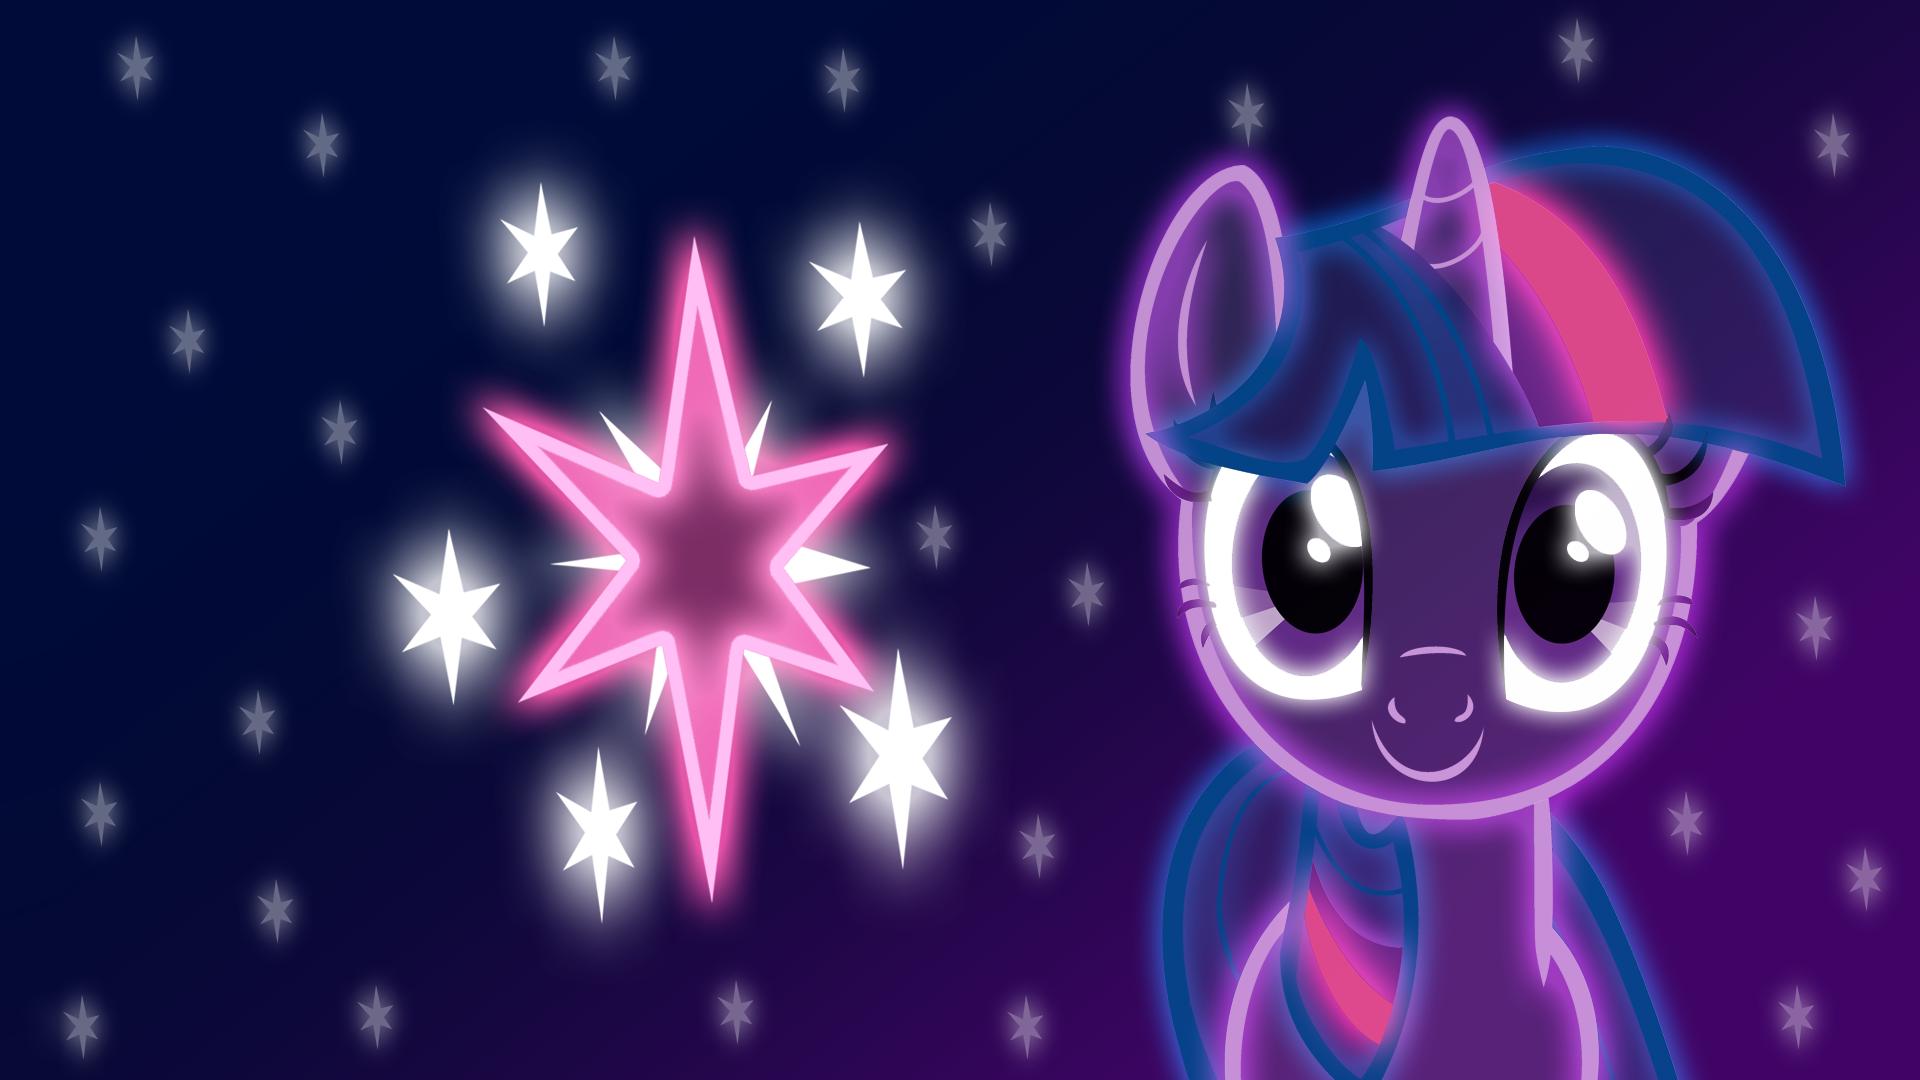 Twilight Sparkle wallpaper - 696612